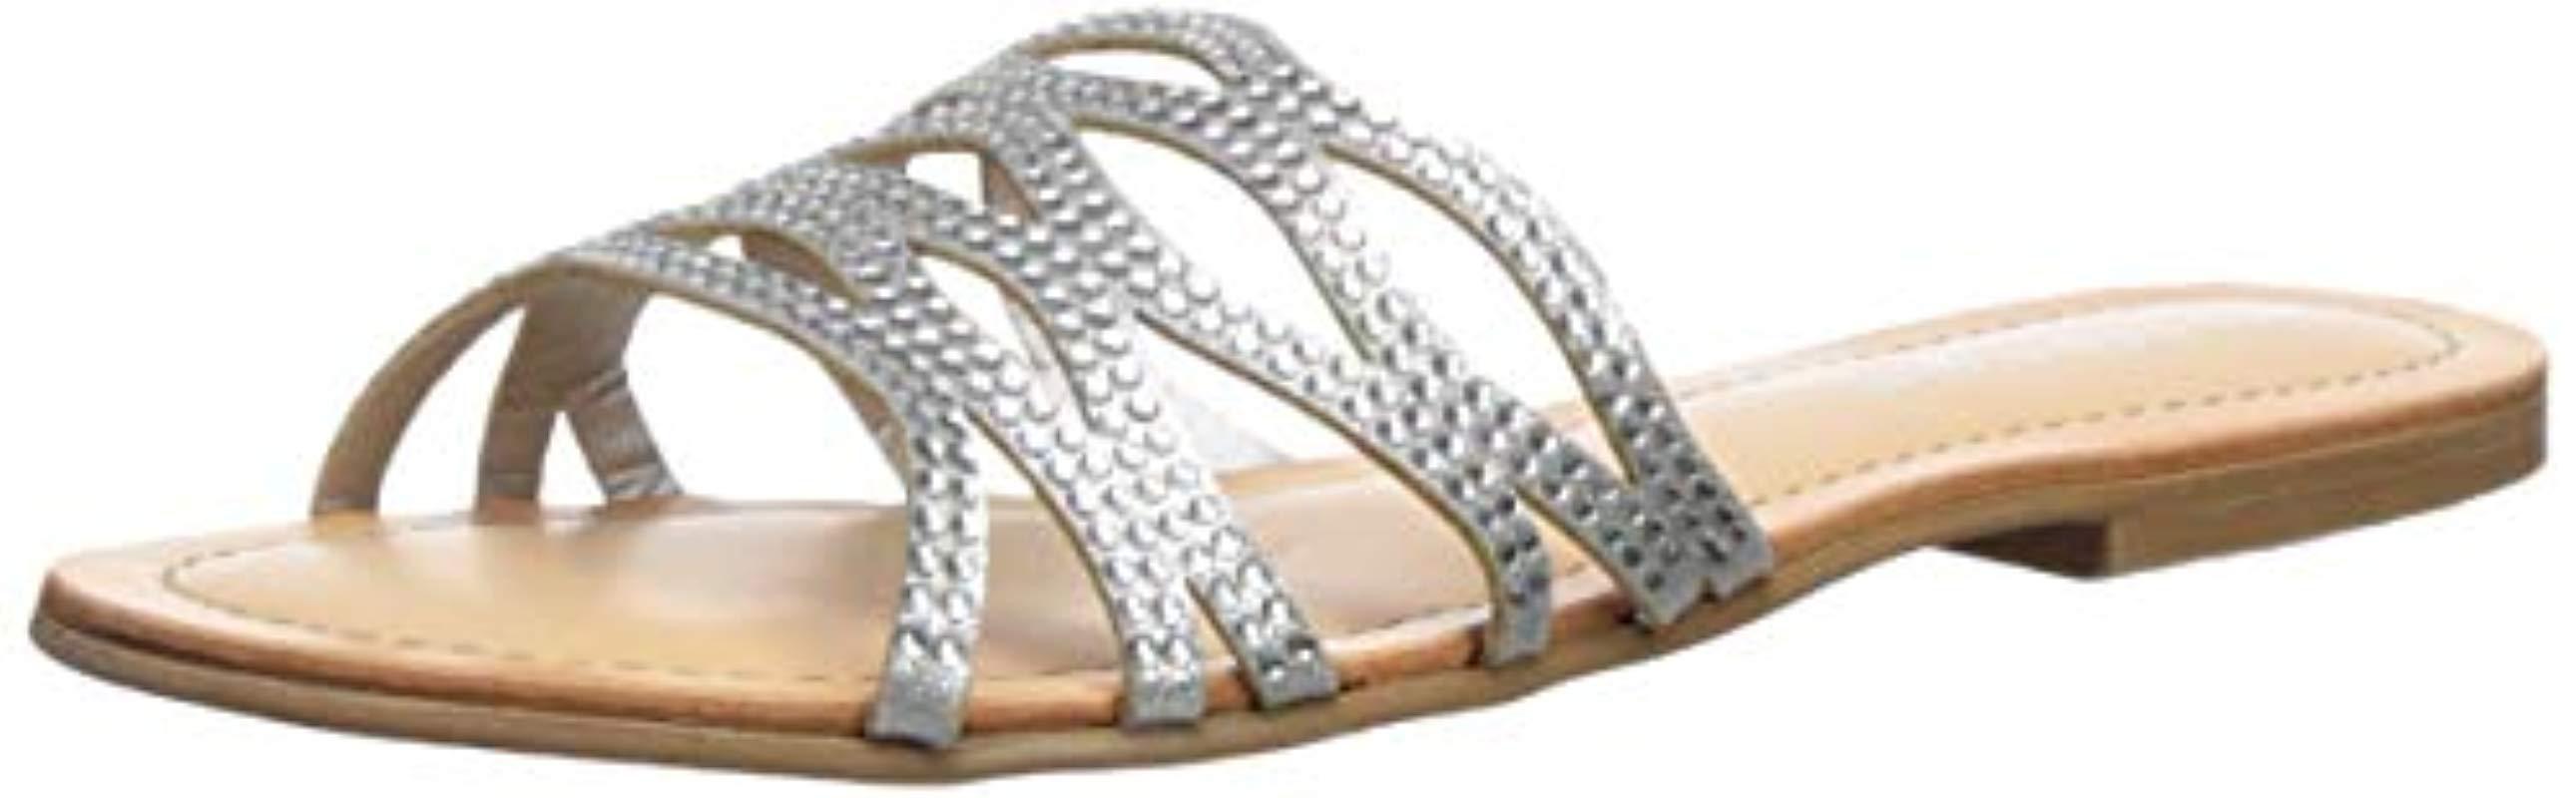 f7170c476f3 Lyst - Madden Girl Sundaay Slide Sandal in Metallic